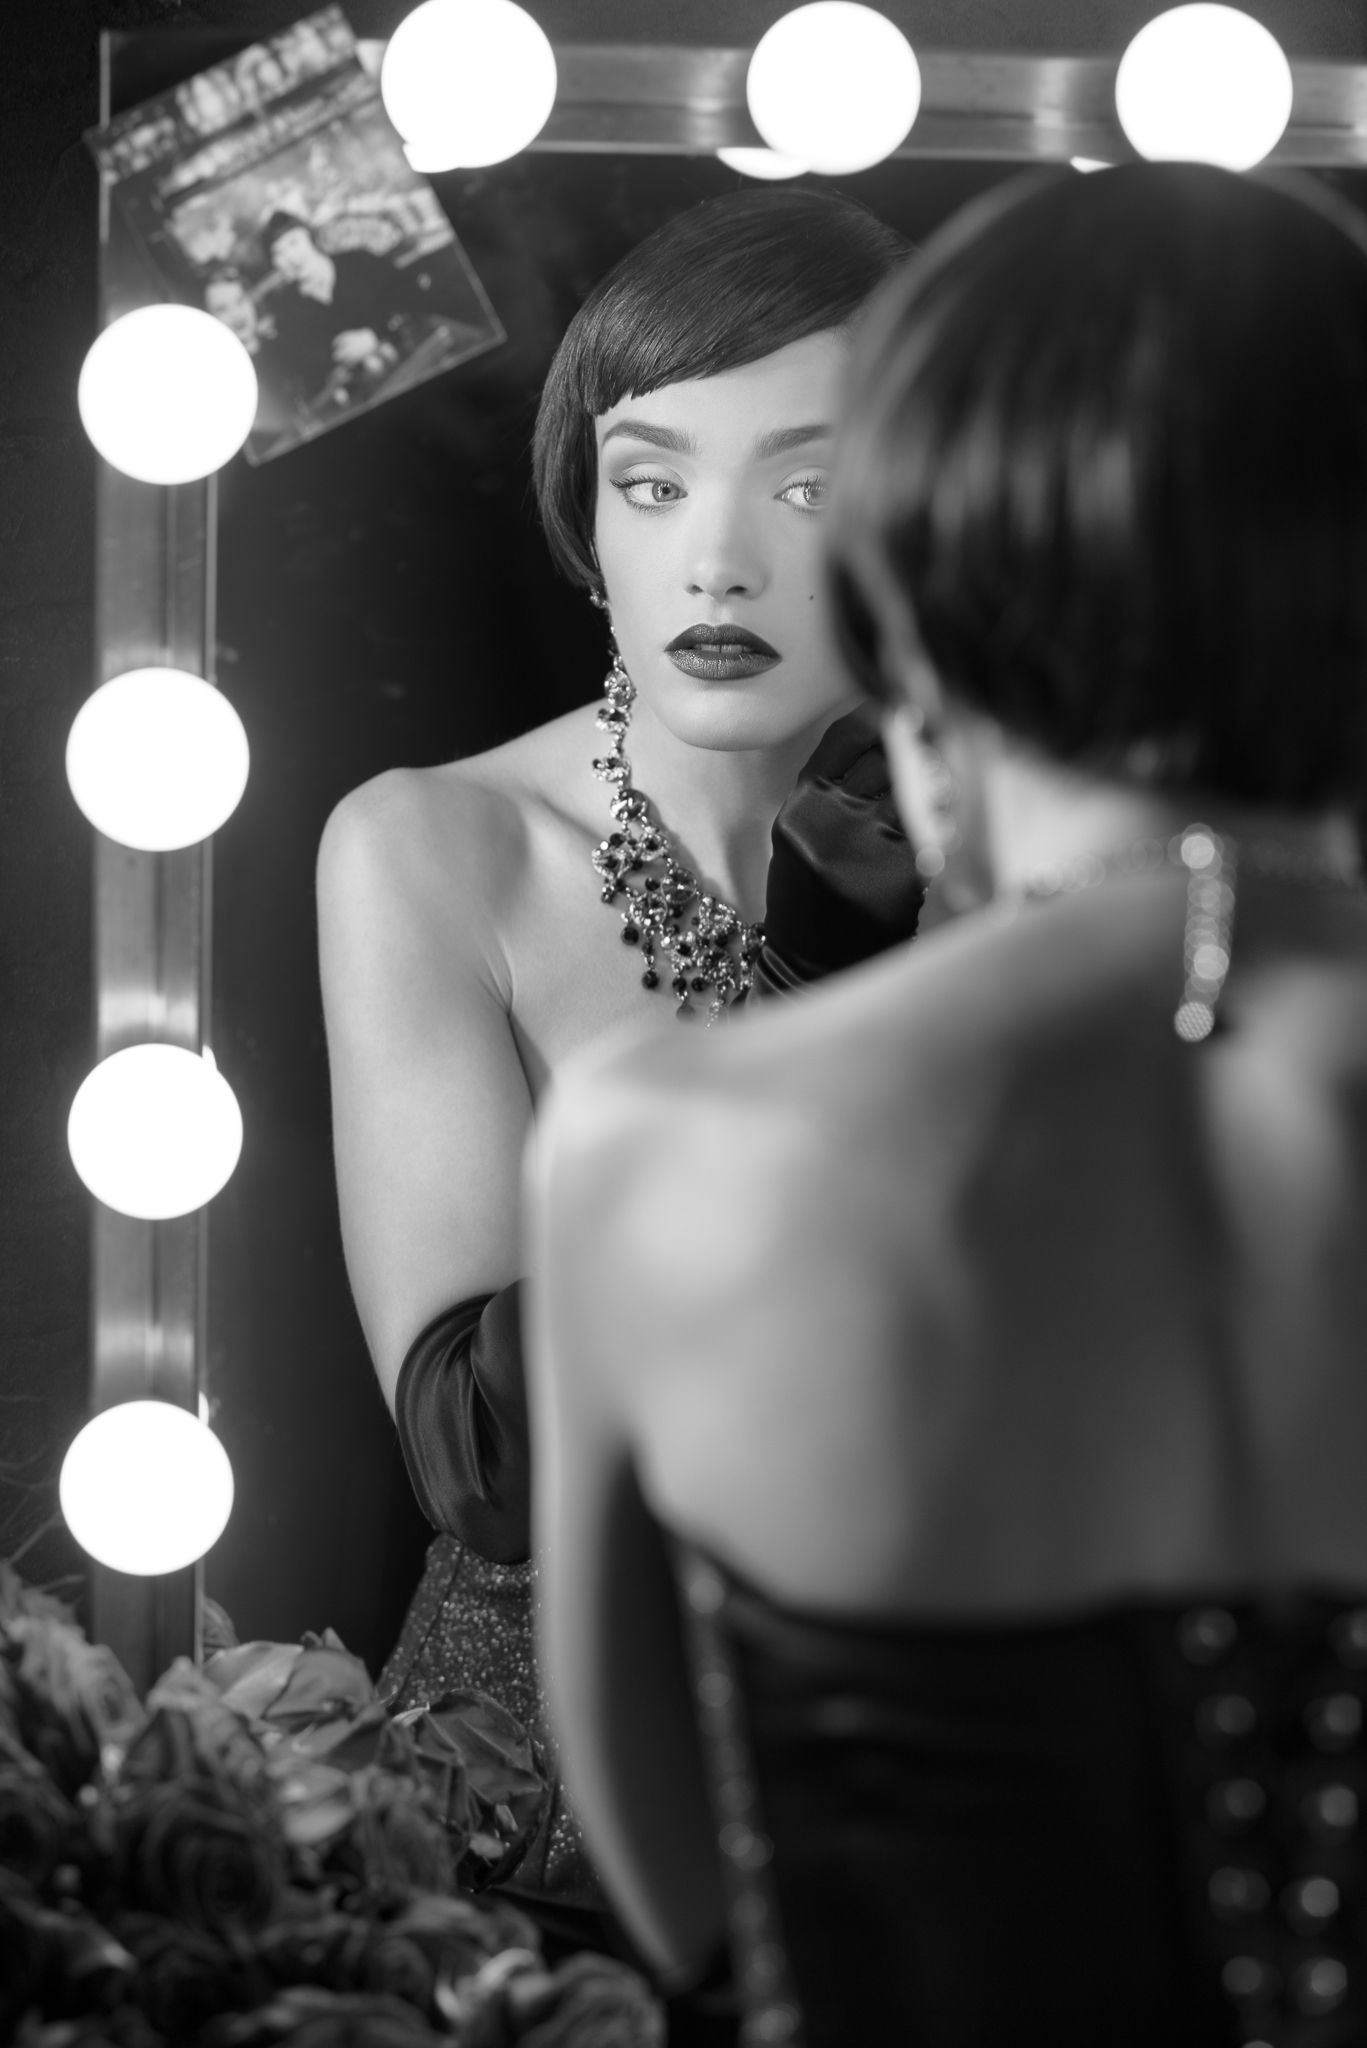 Editorial - Diva en Noir - Pic. 3